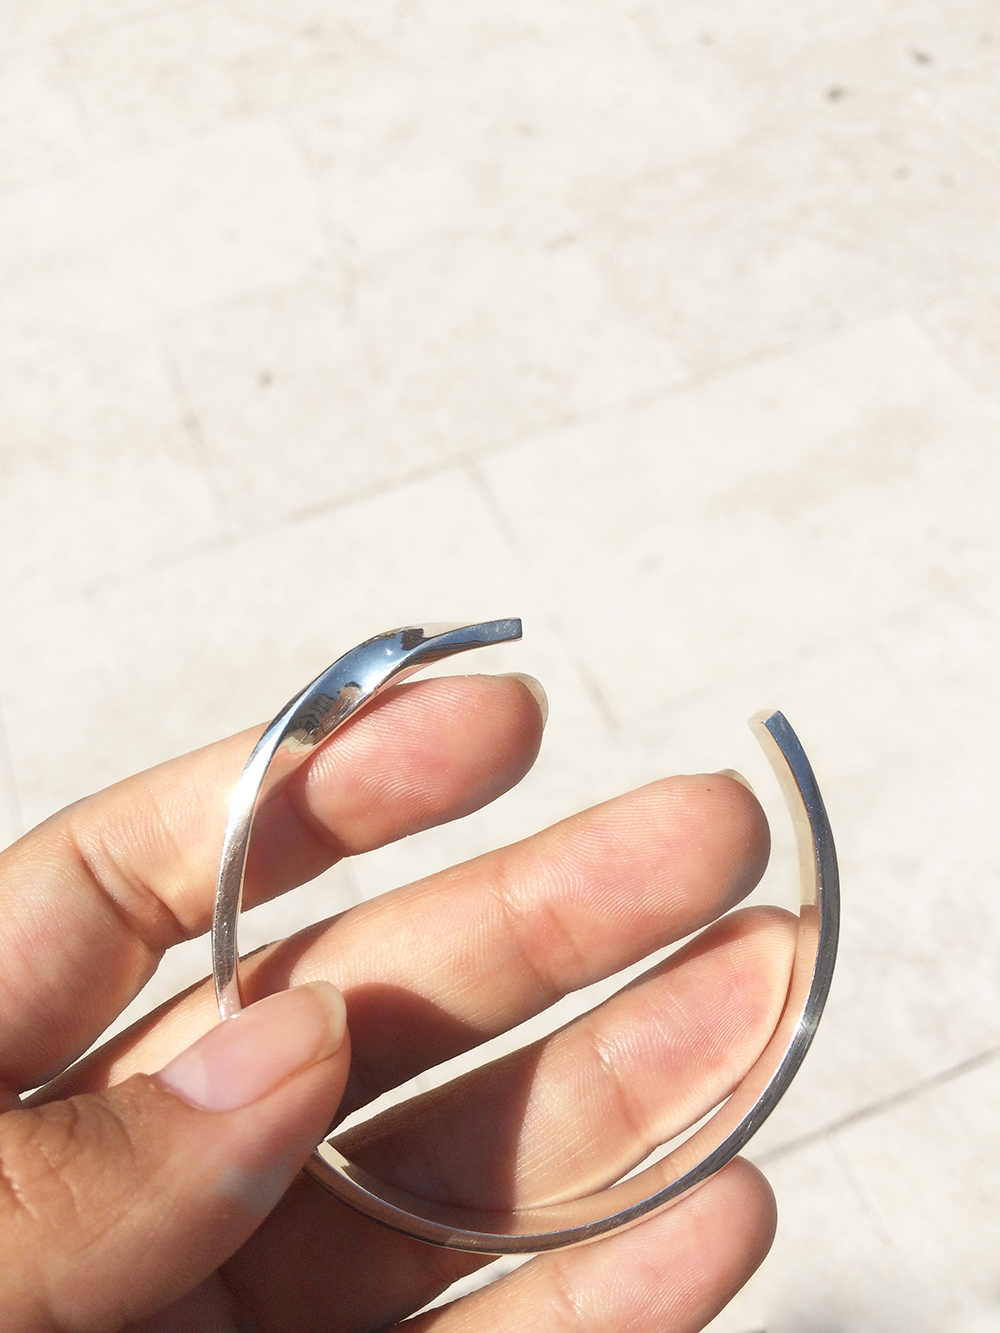 Minutiae bracelet made in sterling silver